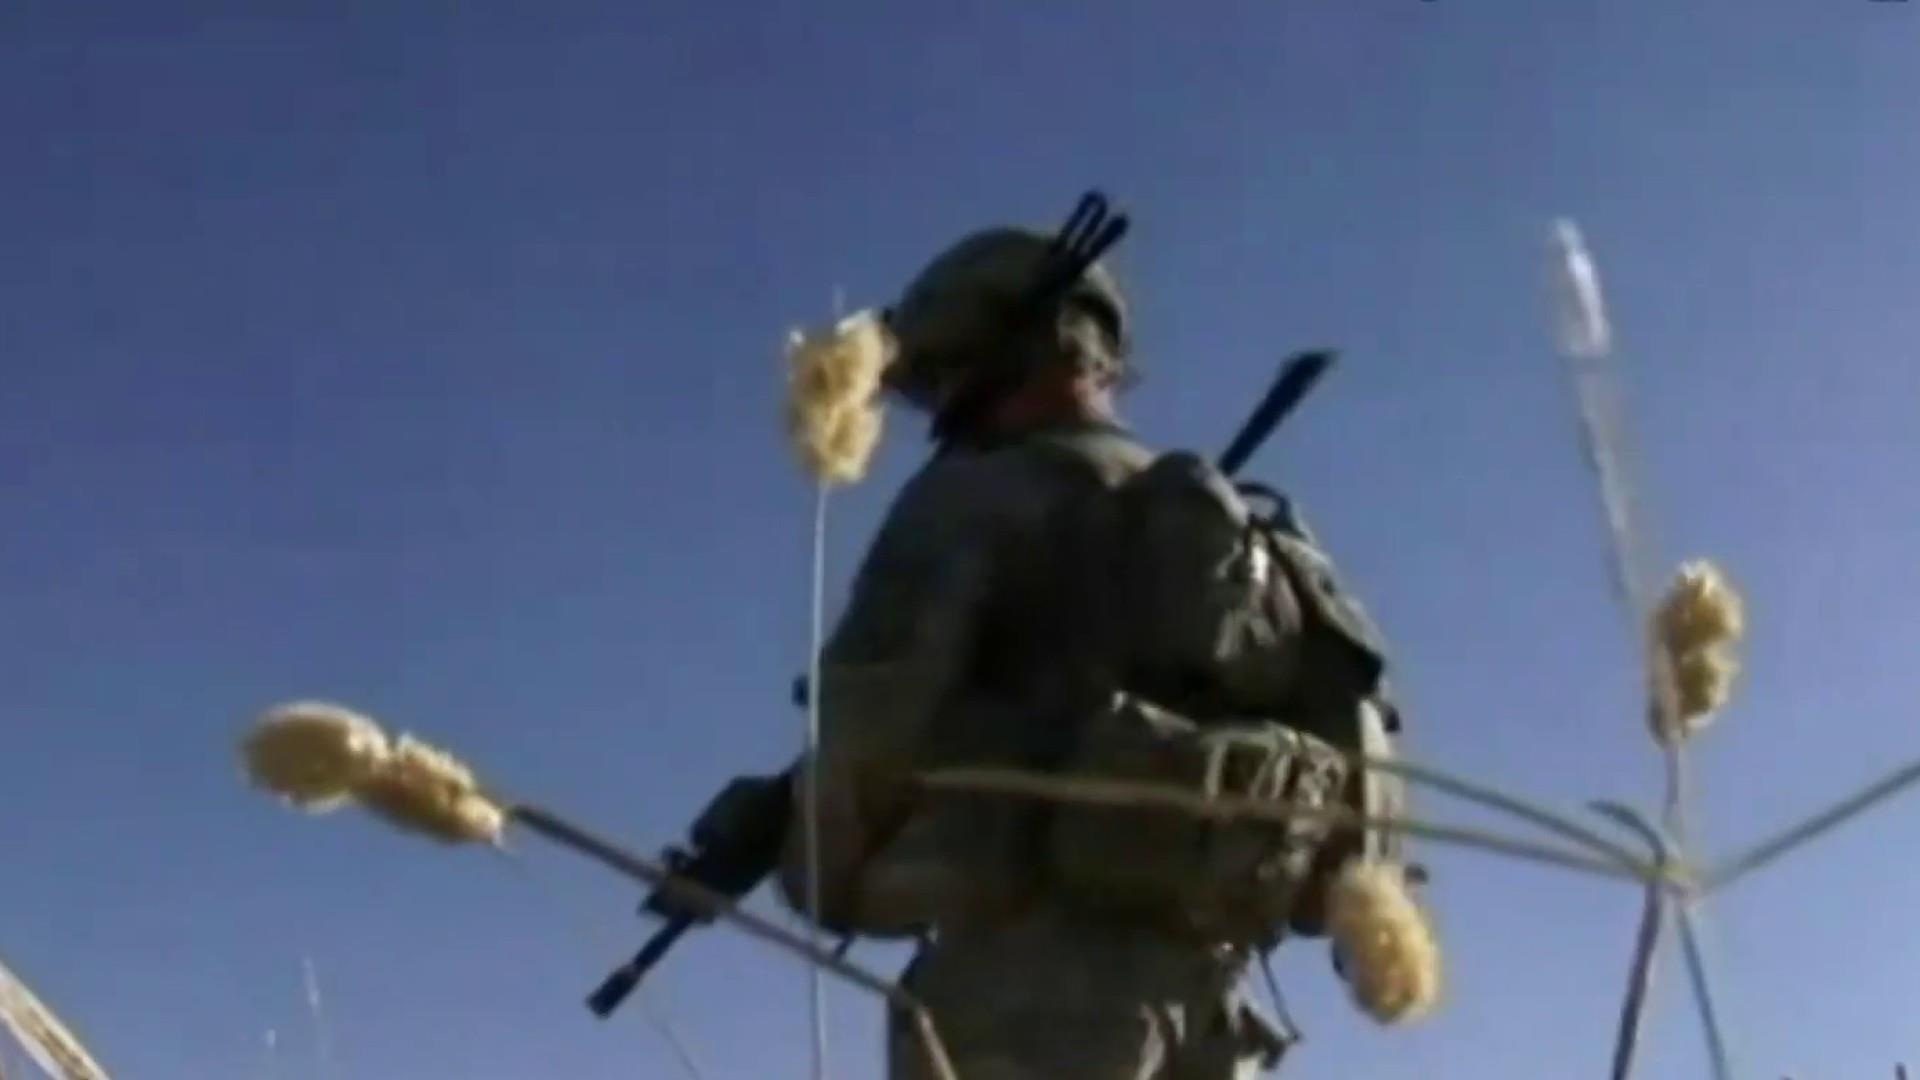 Pompeo addresses Afghanistan agreement saying U.S. effort is 'to let the Afghans lead'